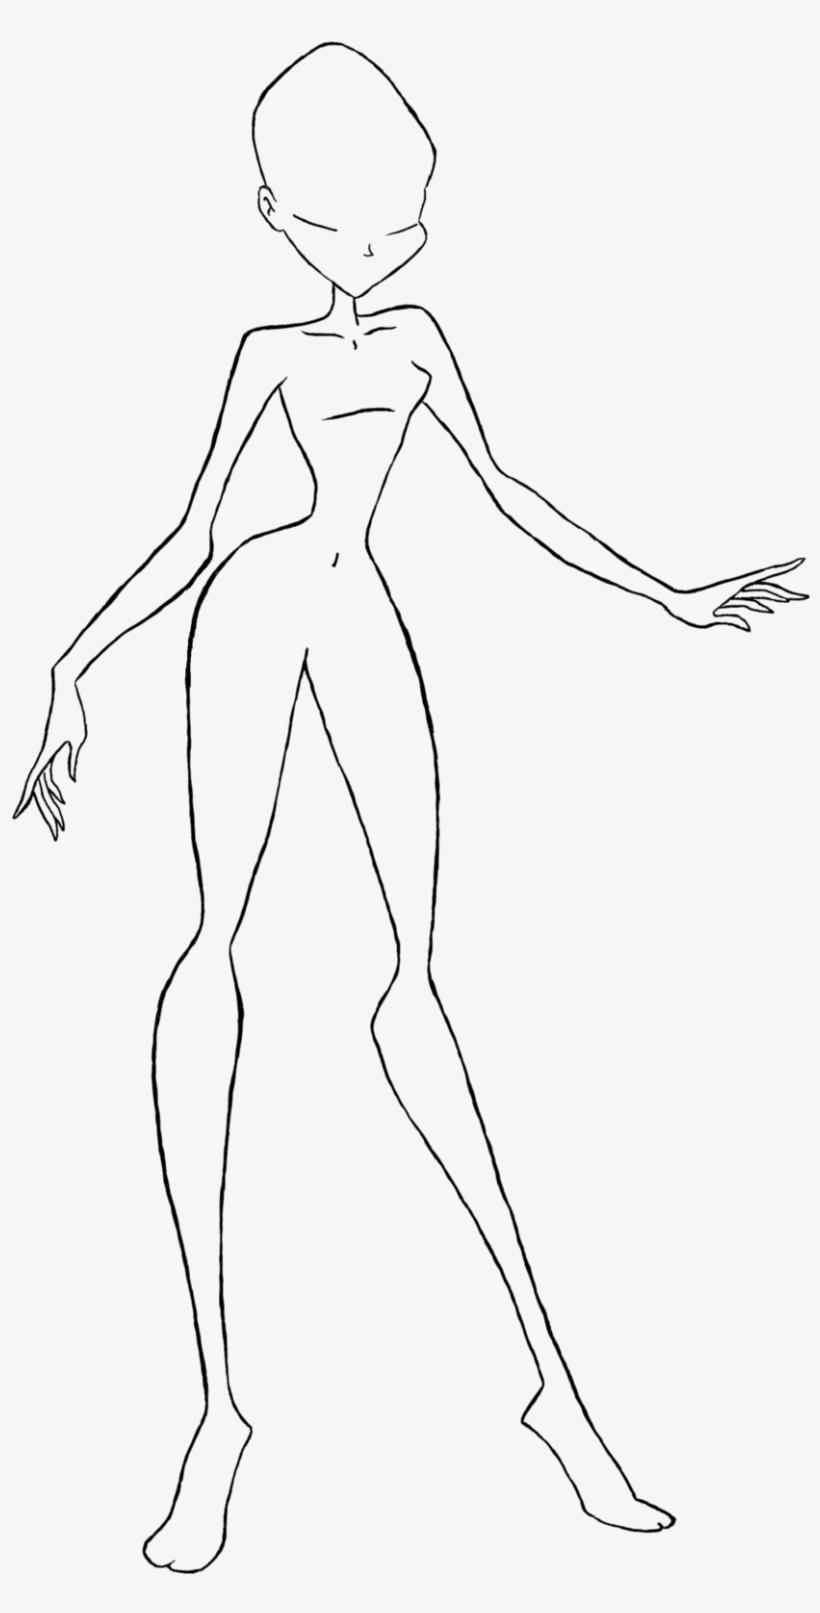 Drawing Body Base : drawing, Drawing, Personal, Image, Transparent, Download, SeekPNG